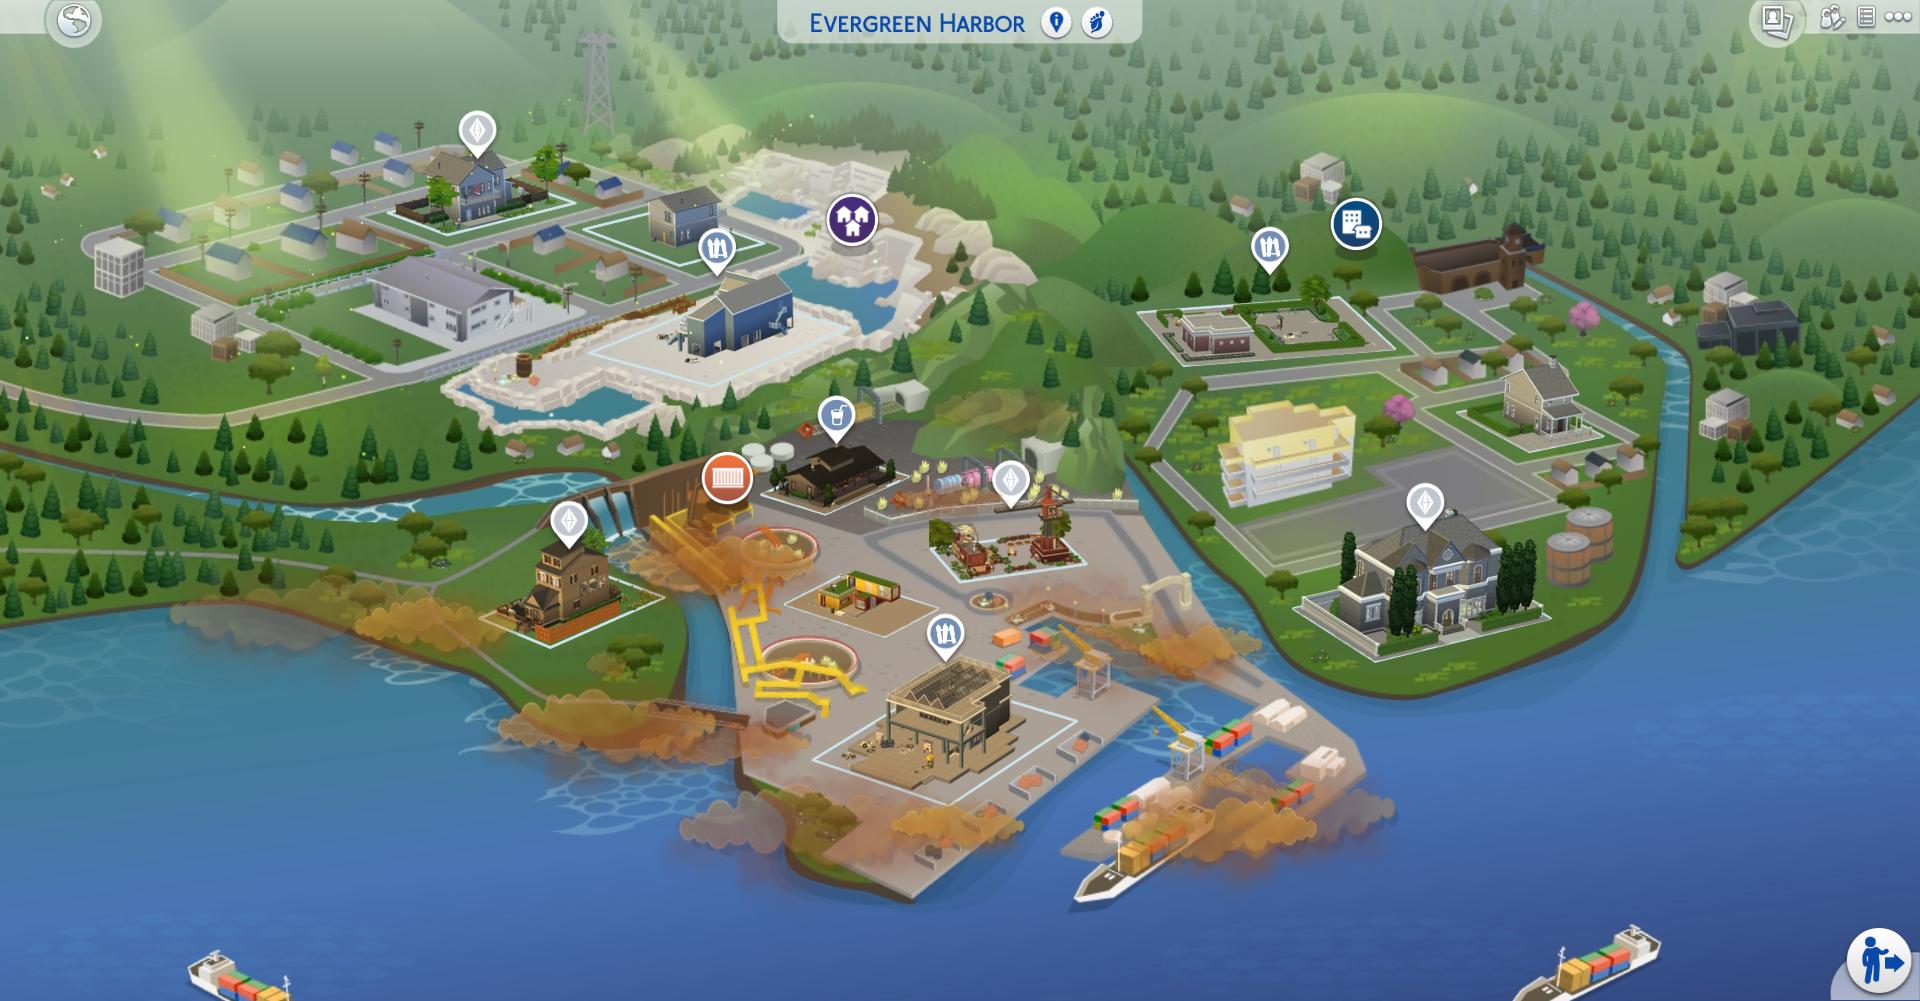 Evergreen Harbor